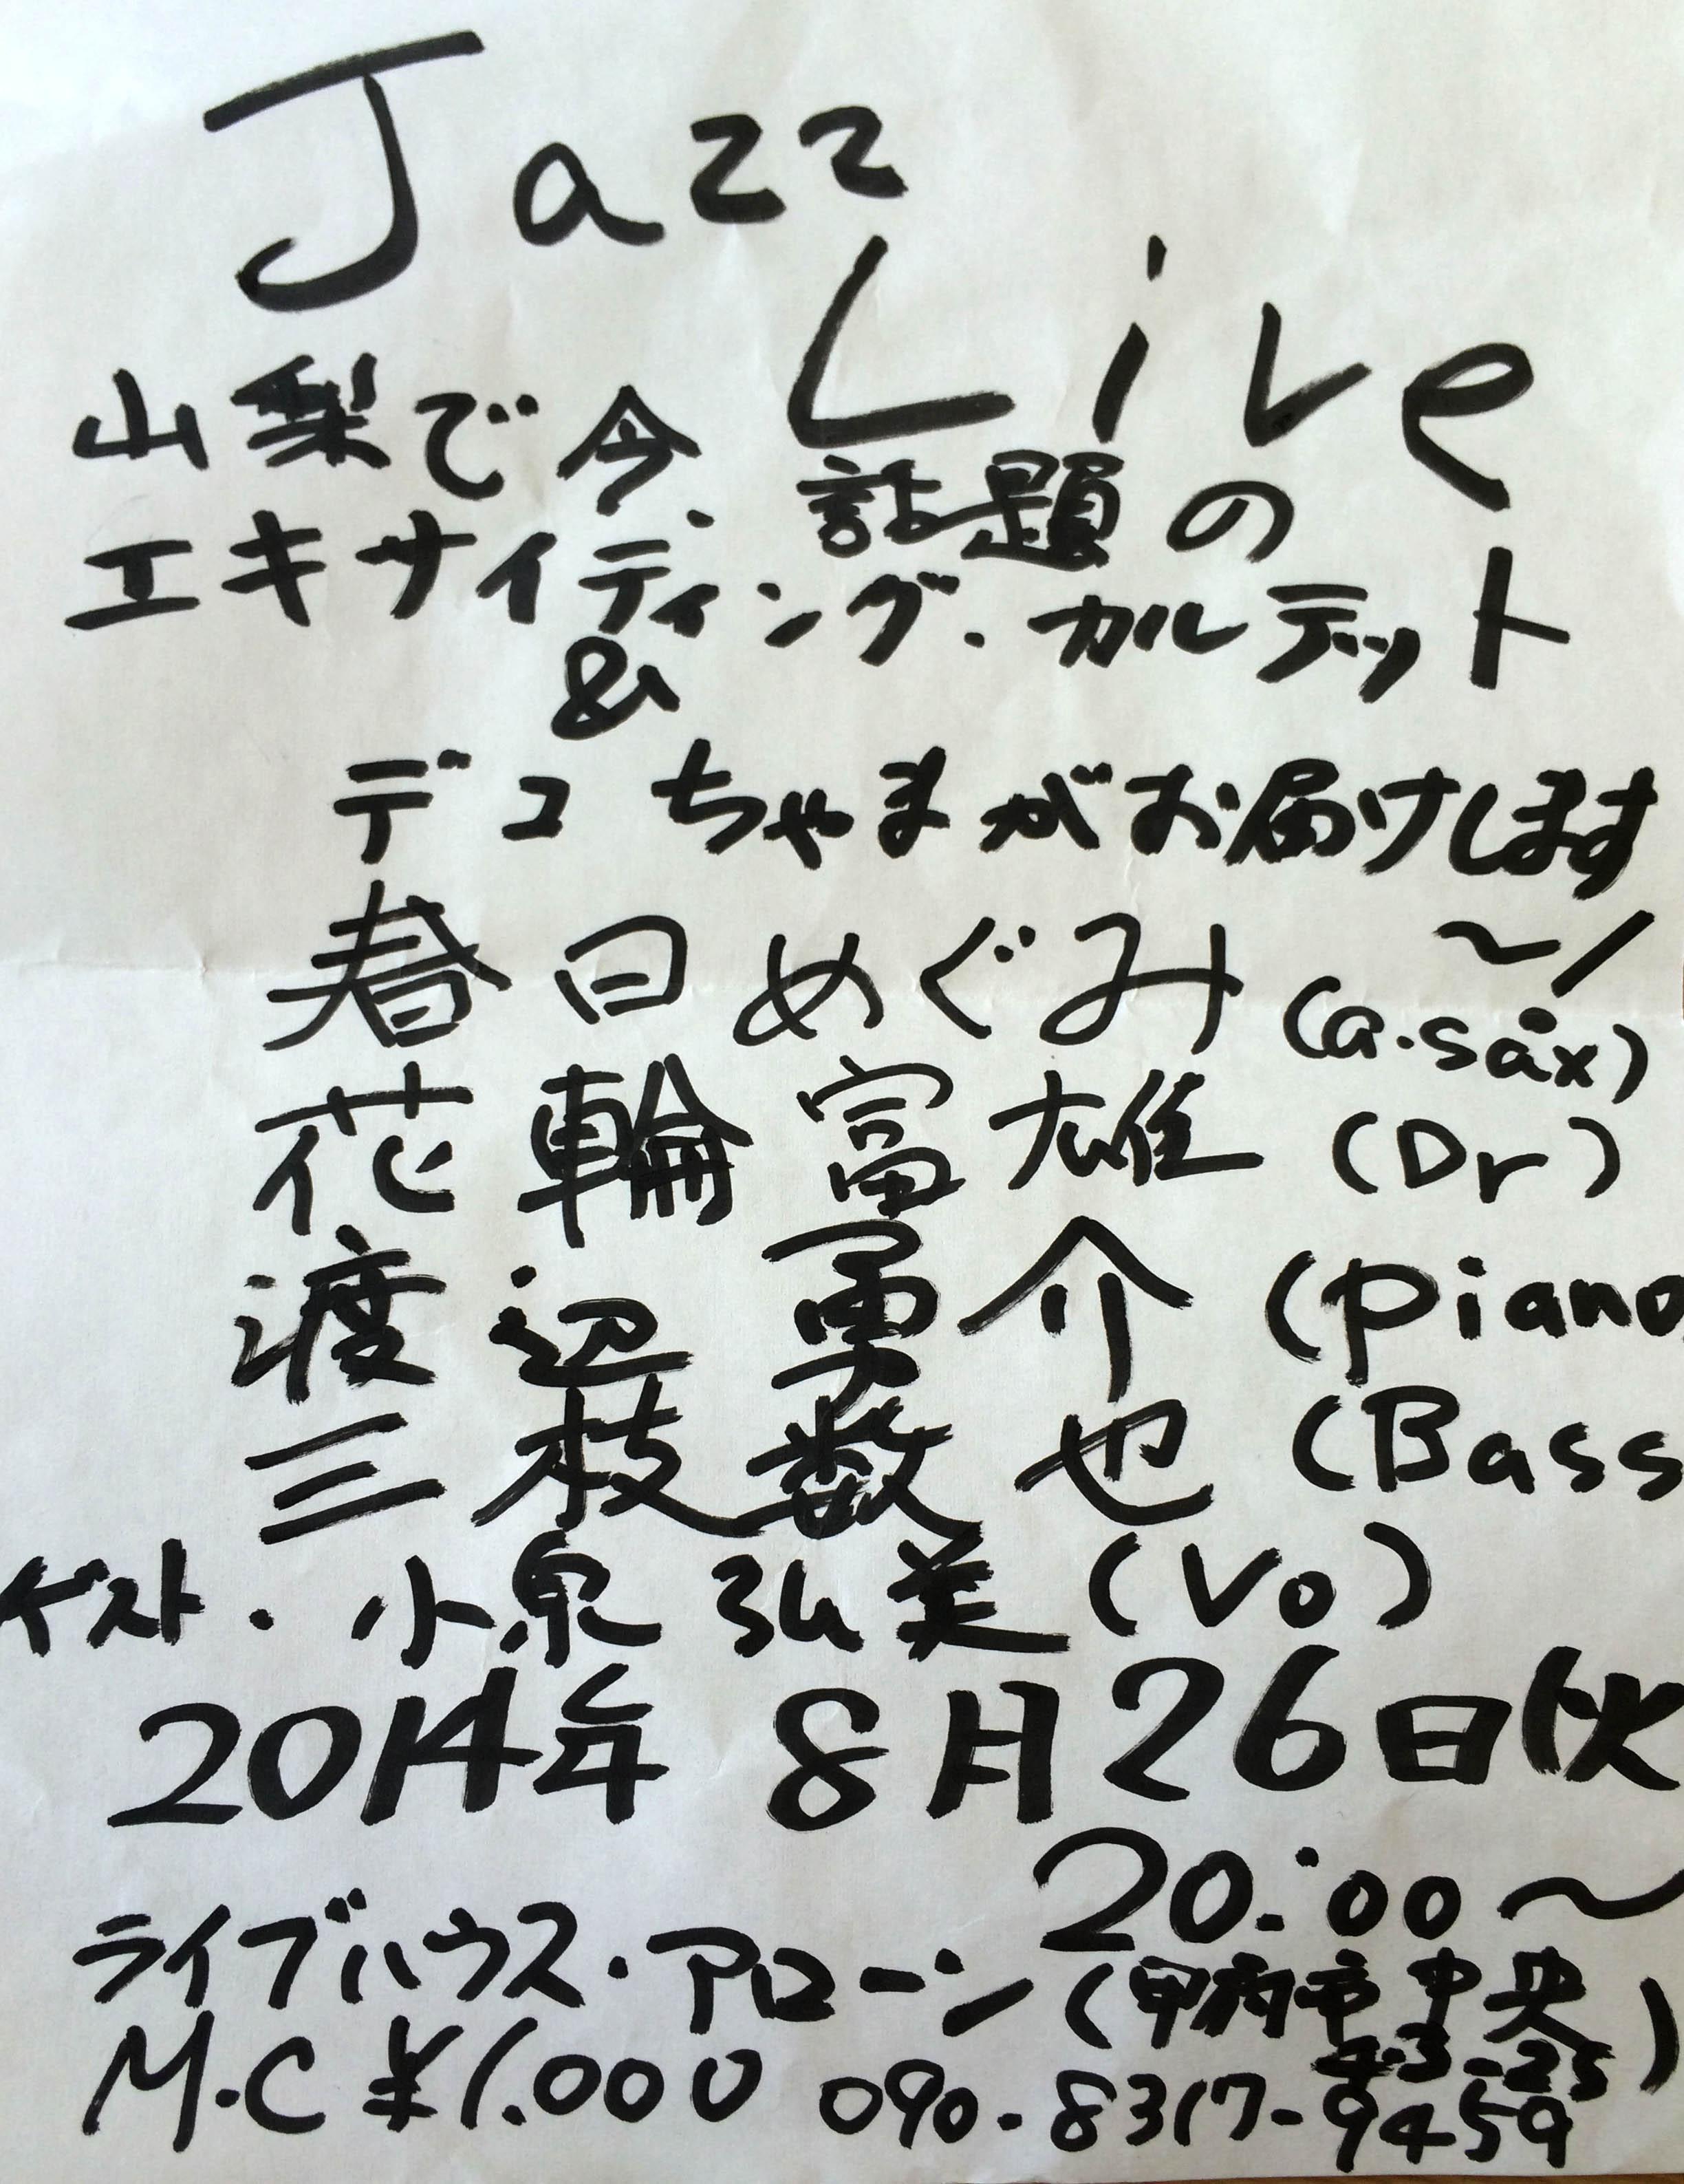 http://kirari-j.com/info/2014/08/25/IMG_3530_1.jpg